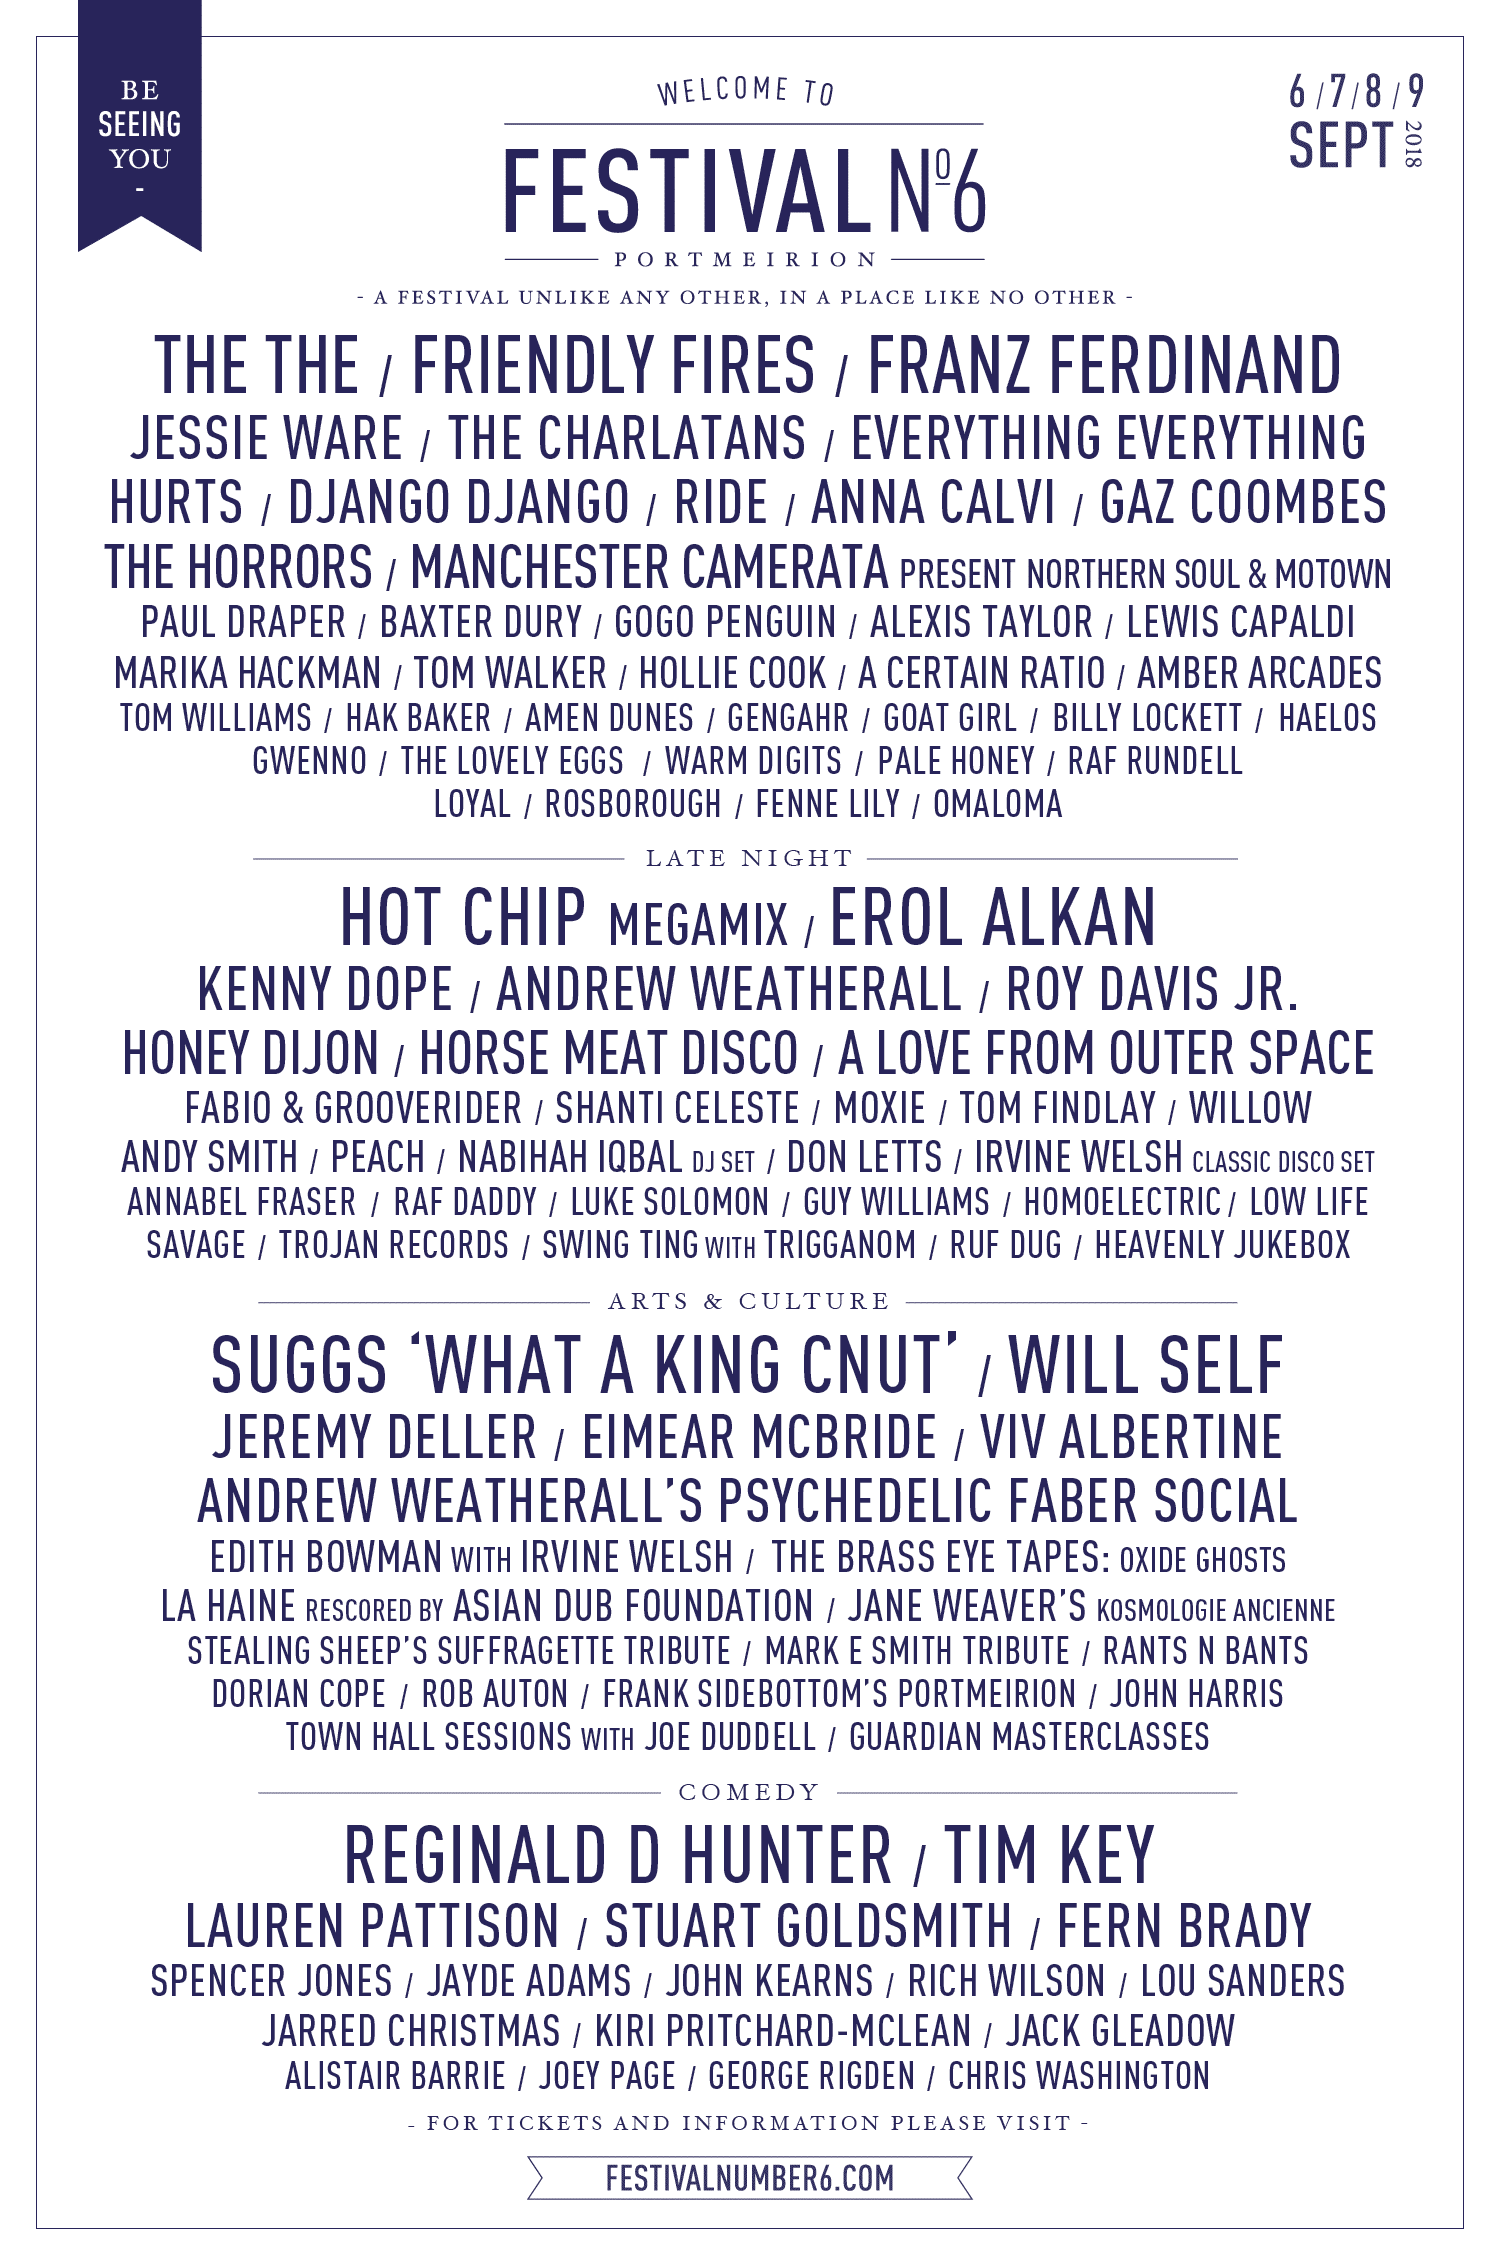 Festival estate breve guida | Collater.al fn6